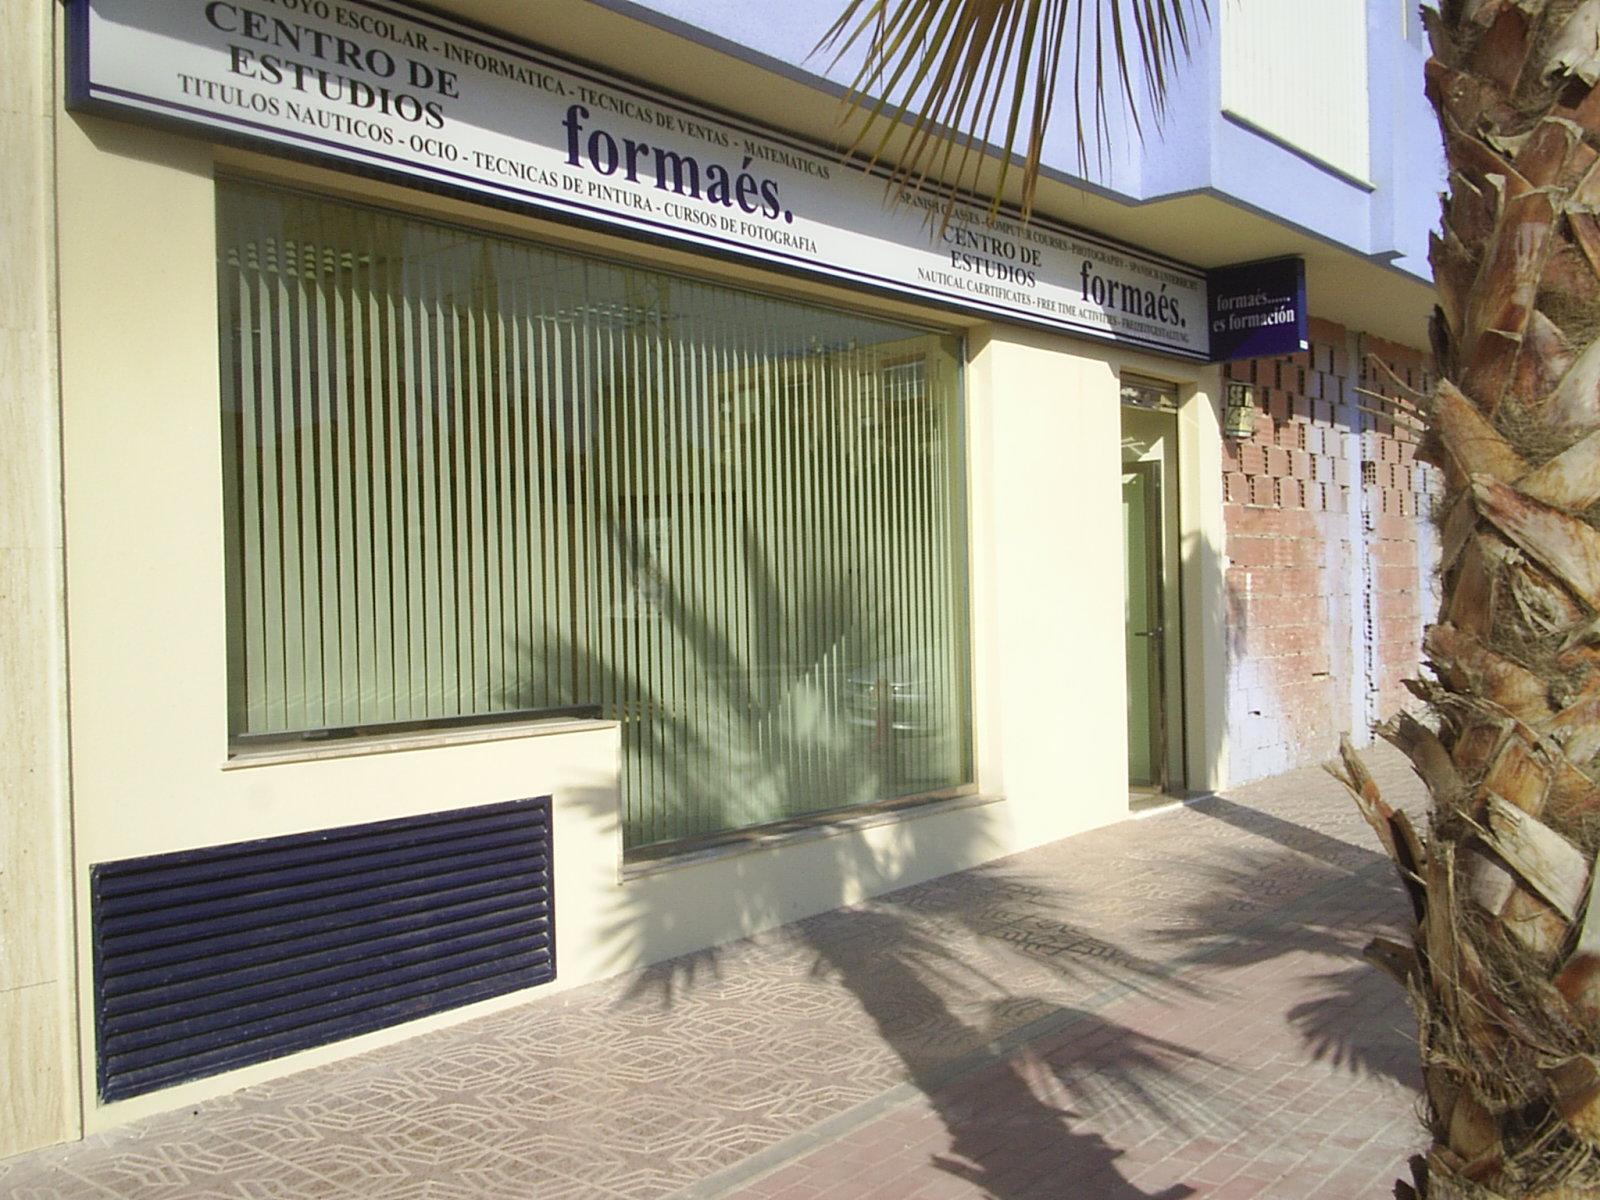 FRANCISCO NAVARRO MONTESINOS